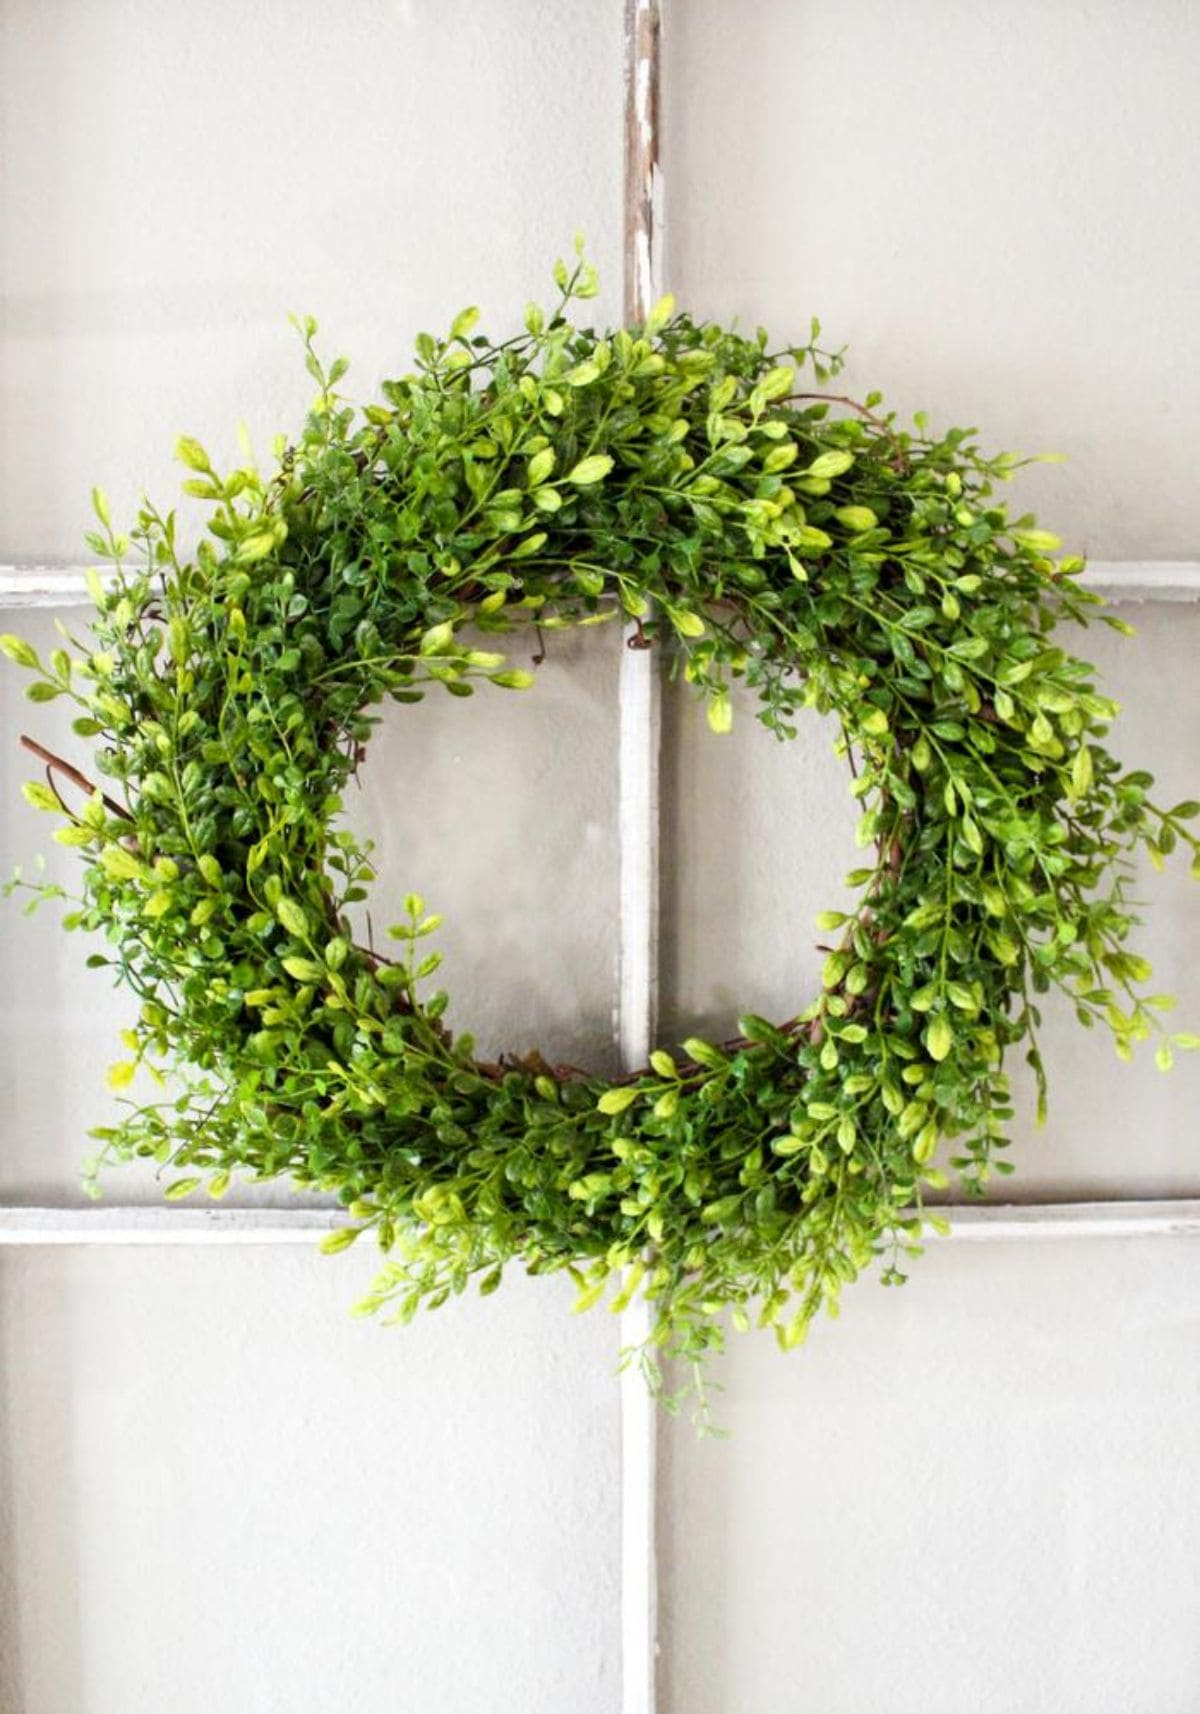 a wreath of green foliage hangs on a white batten wall